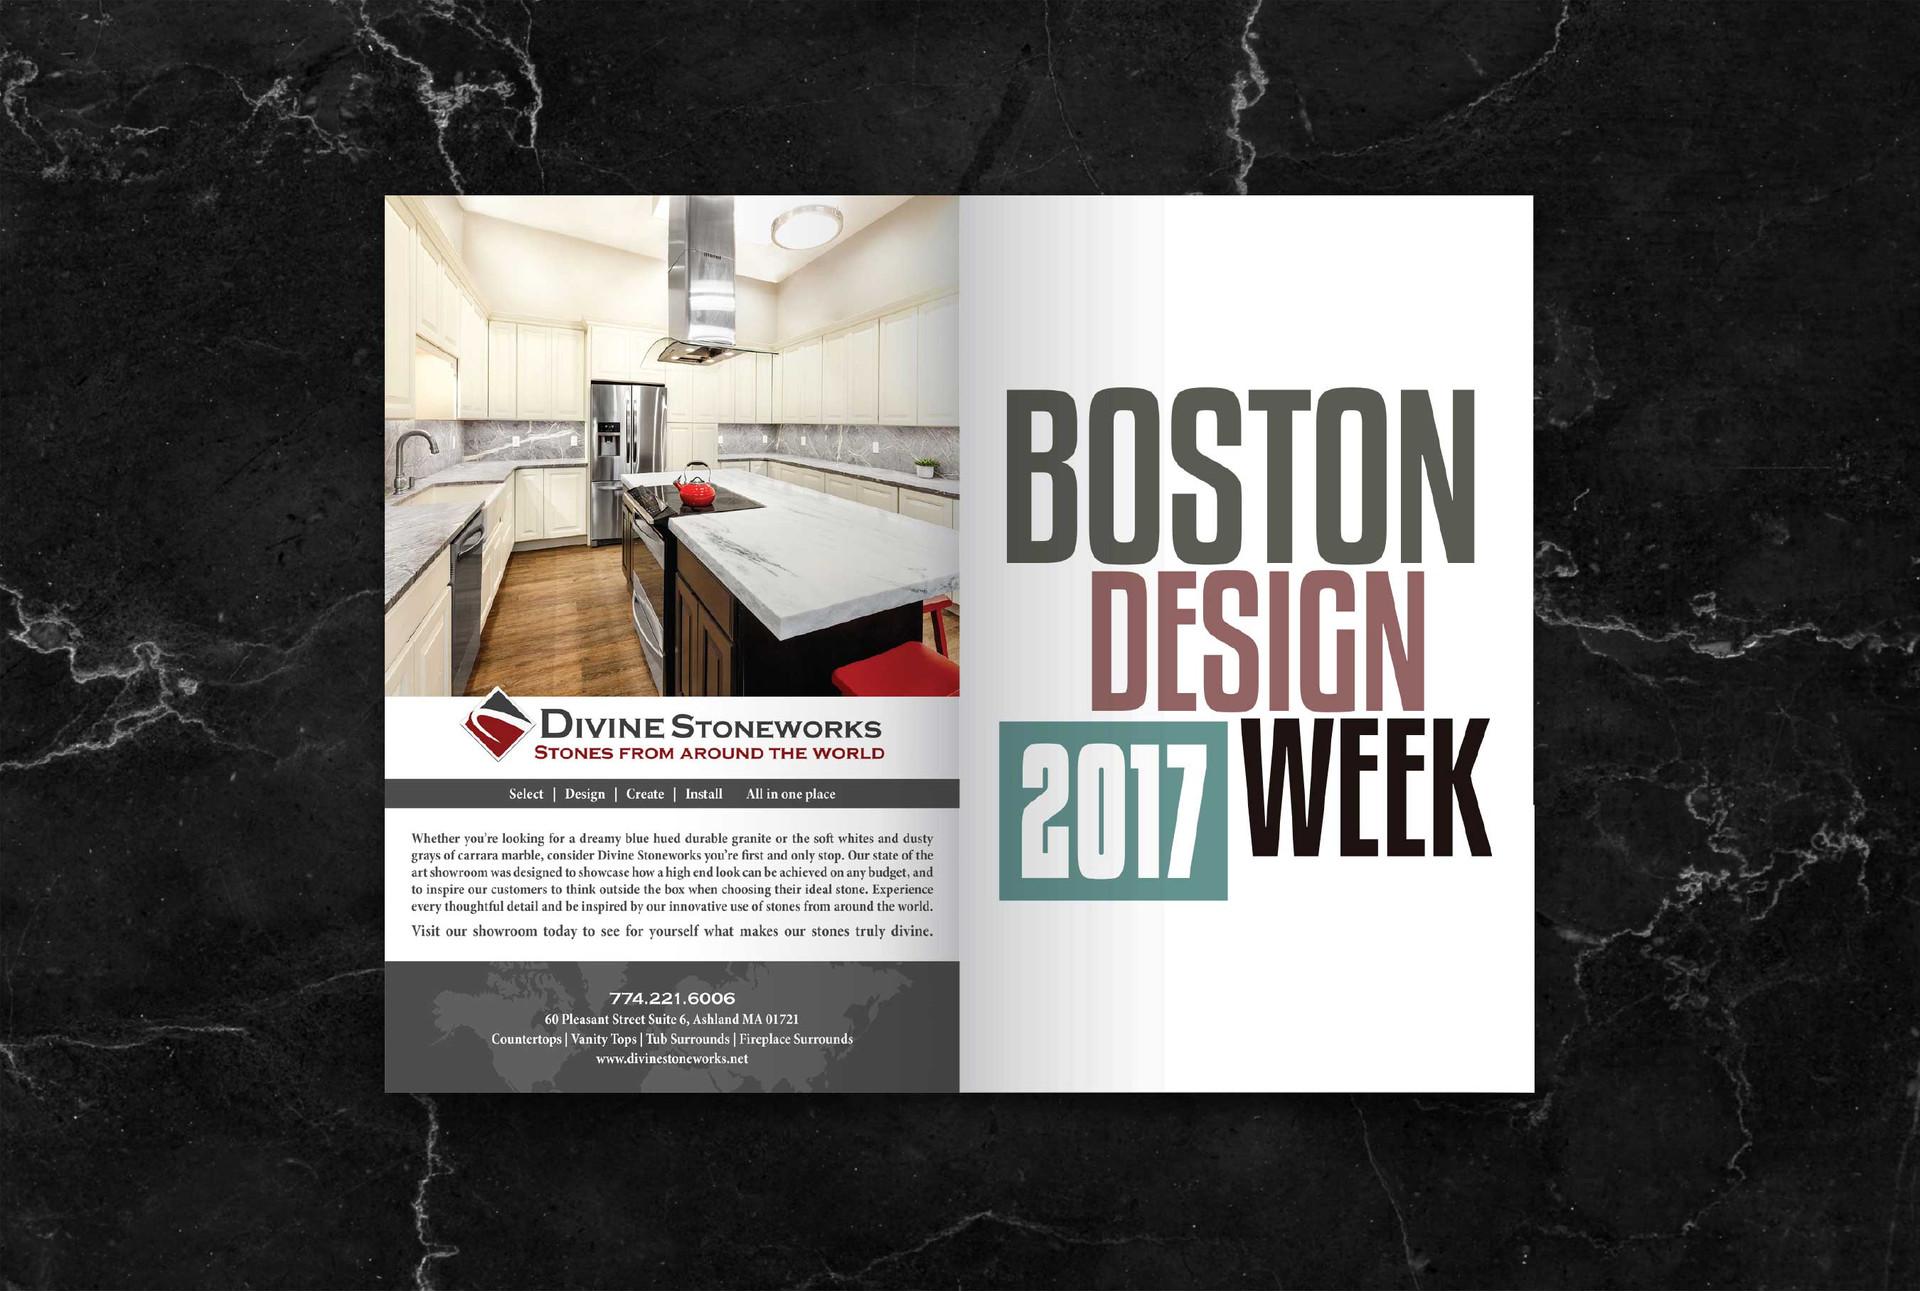 boston design week full-page ad